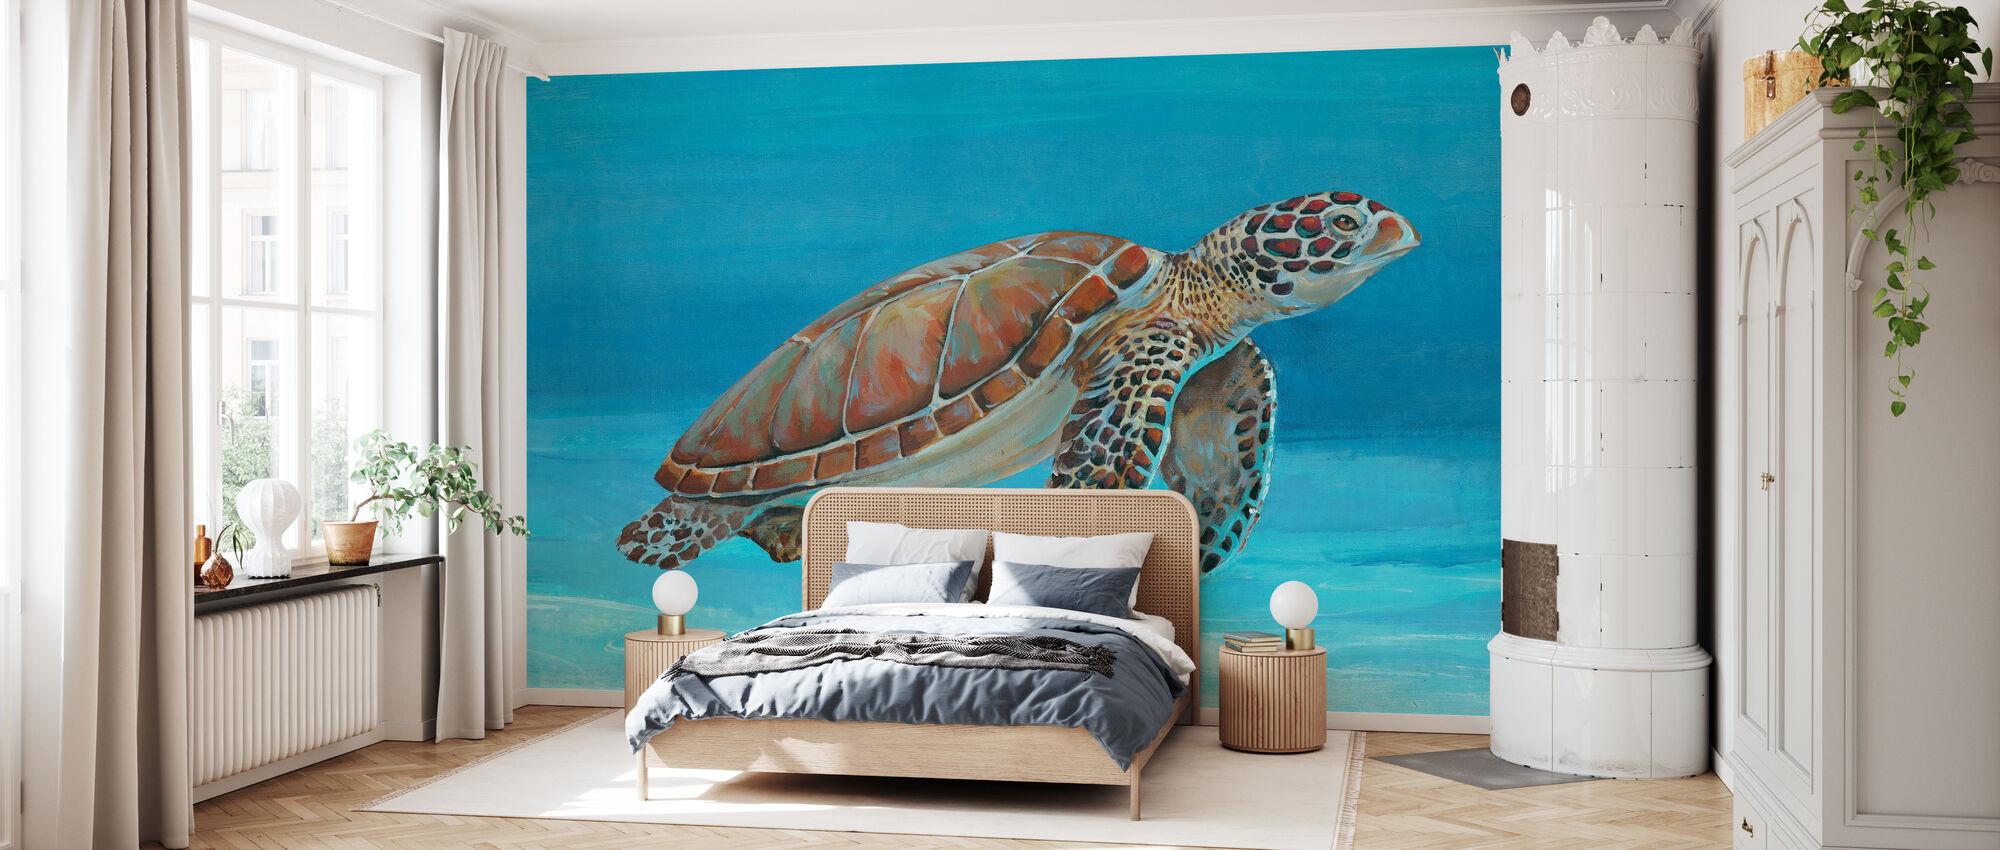 Ocean Sea Turtle - Wallpaper - Bedroom